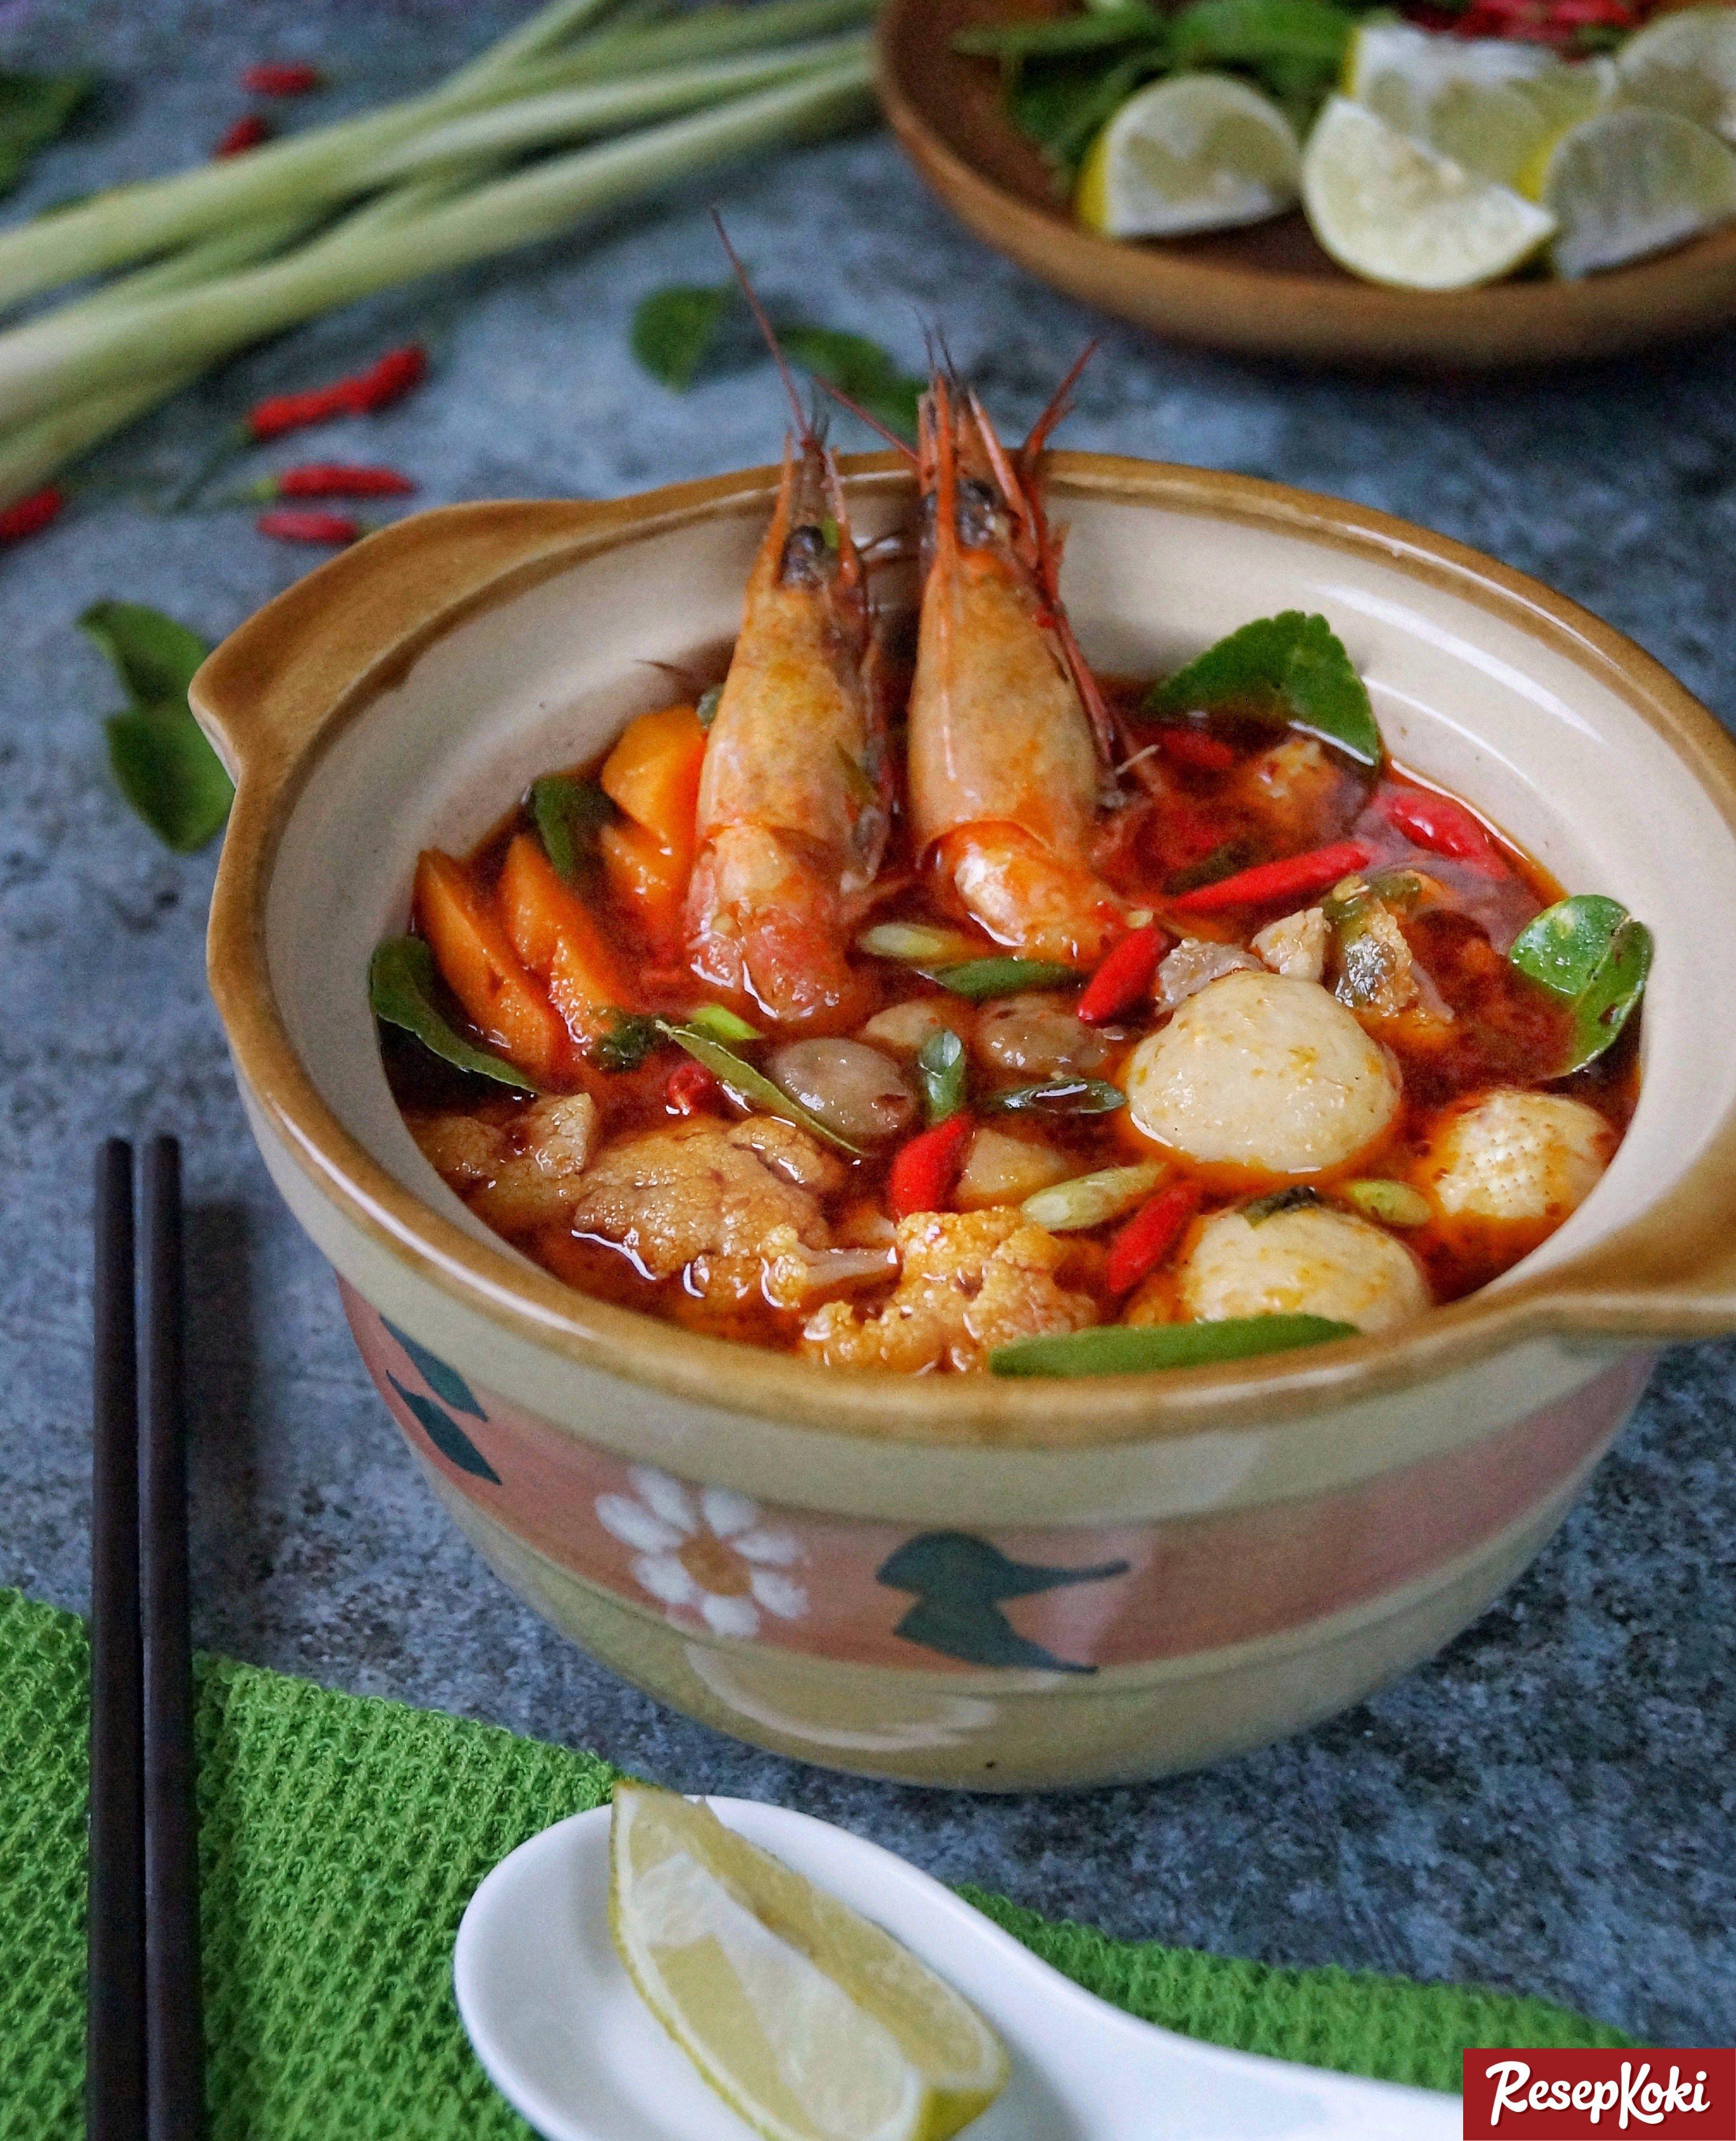 Resep Tom Yam Seafood Resep Makanan Laut Resep Resep Masakan